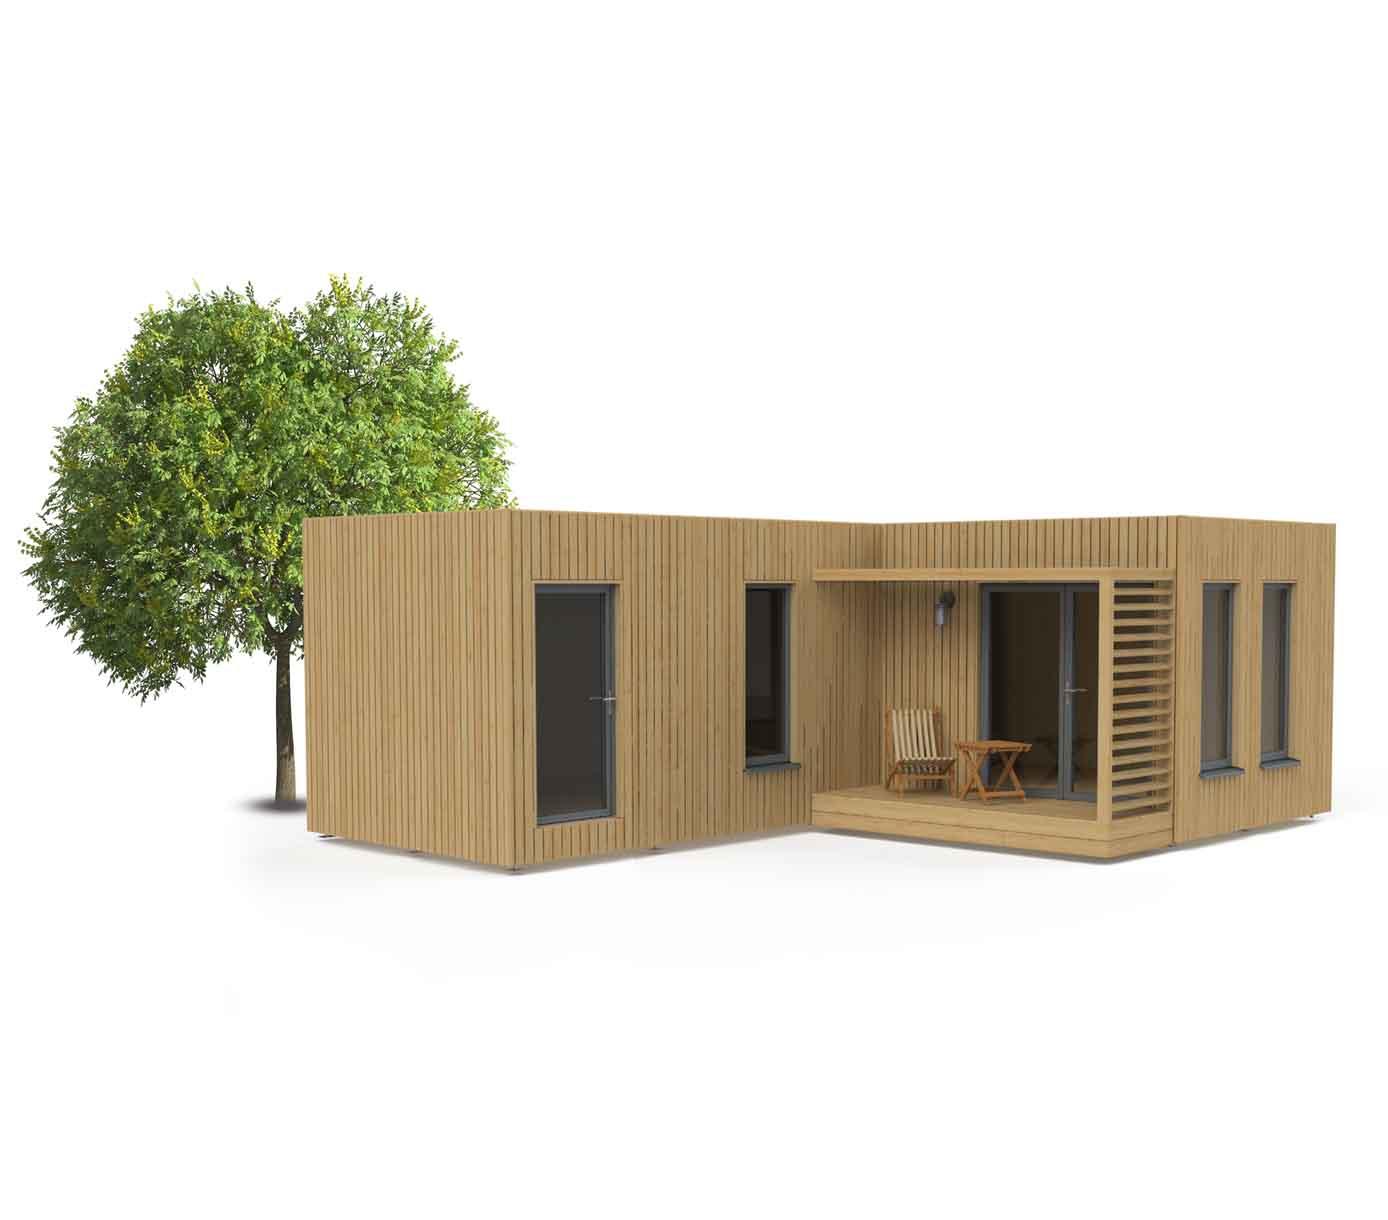 Studio de jardin EdenCube 30m2